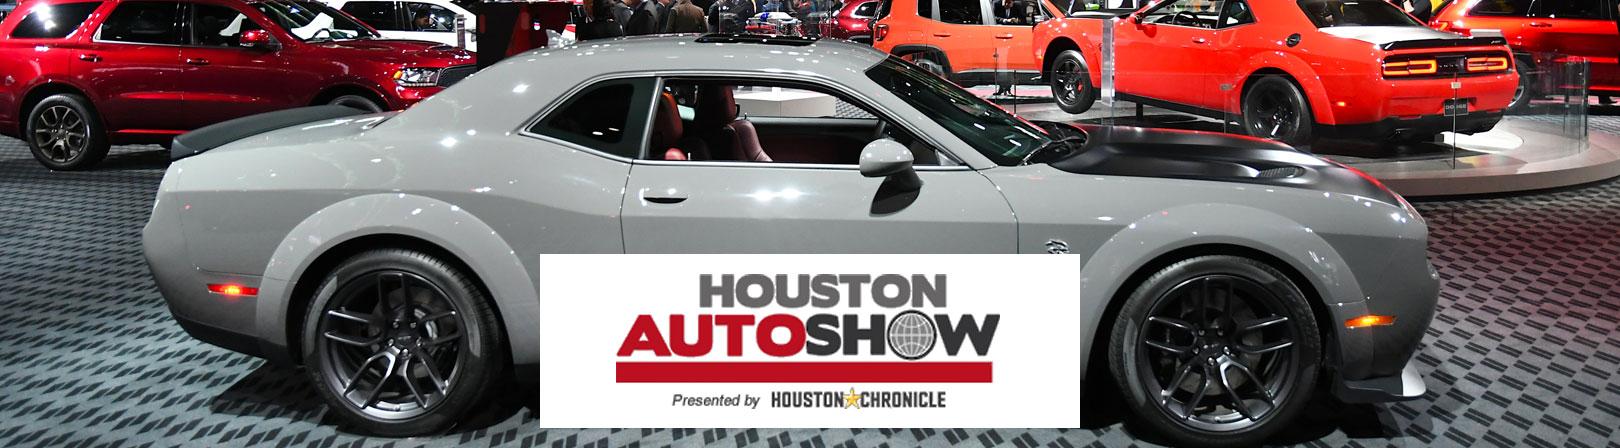 Houston Auto Show | Dodge Garage